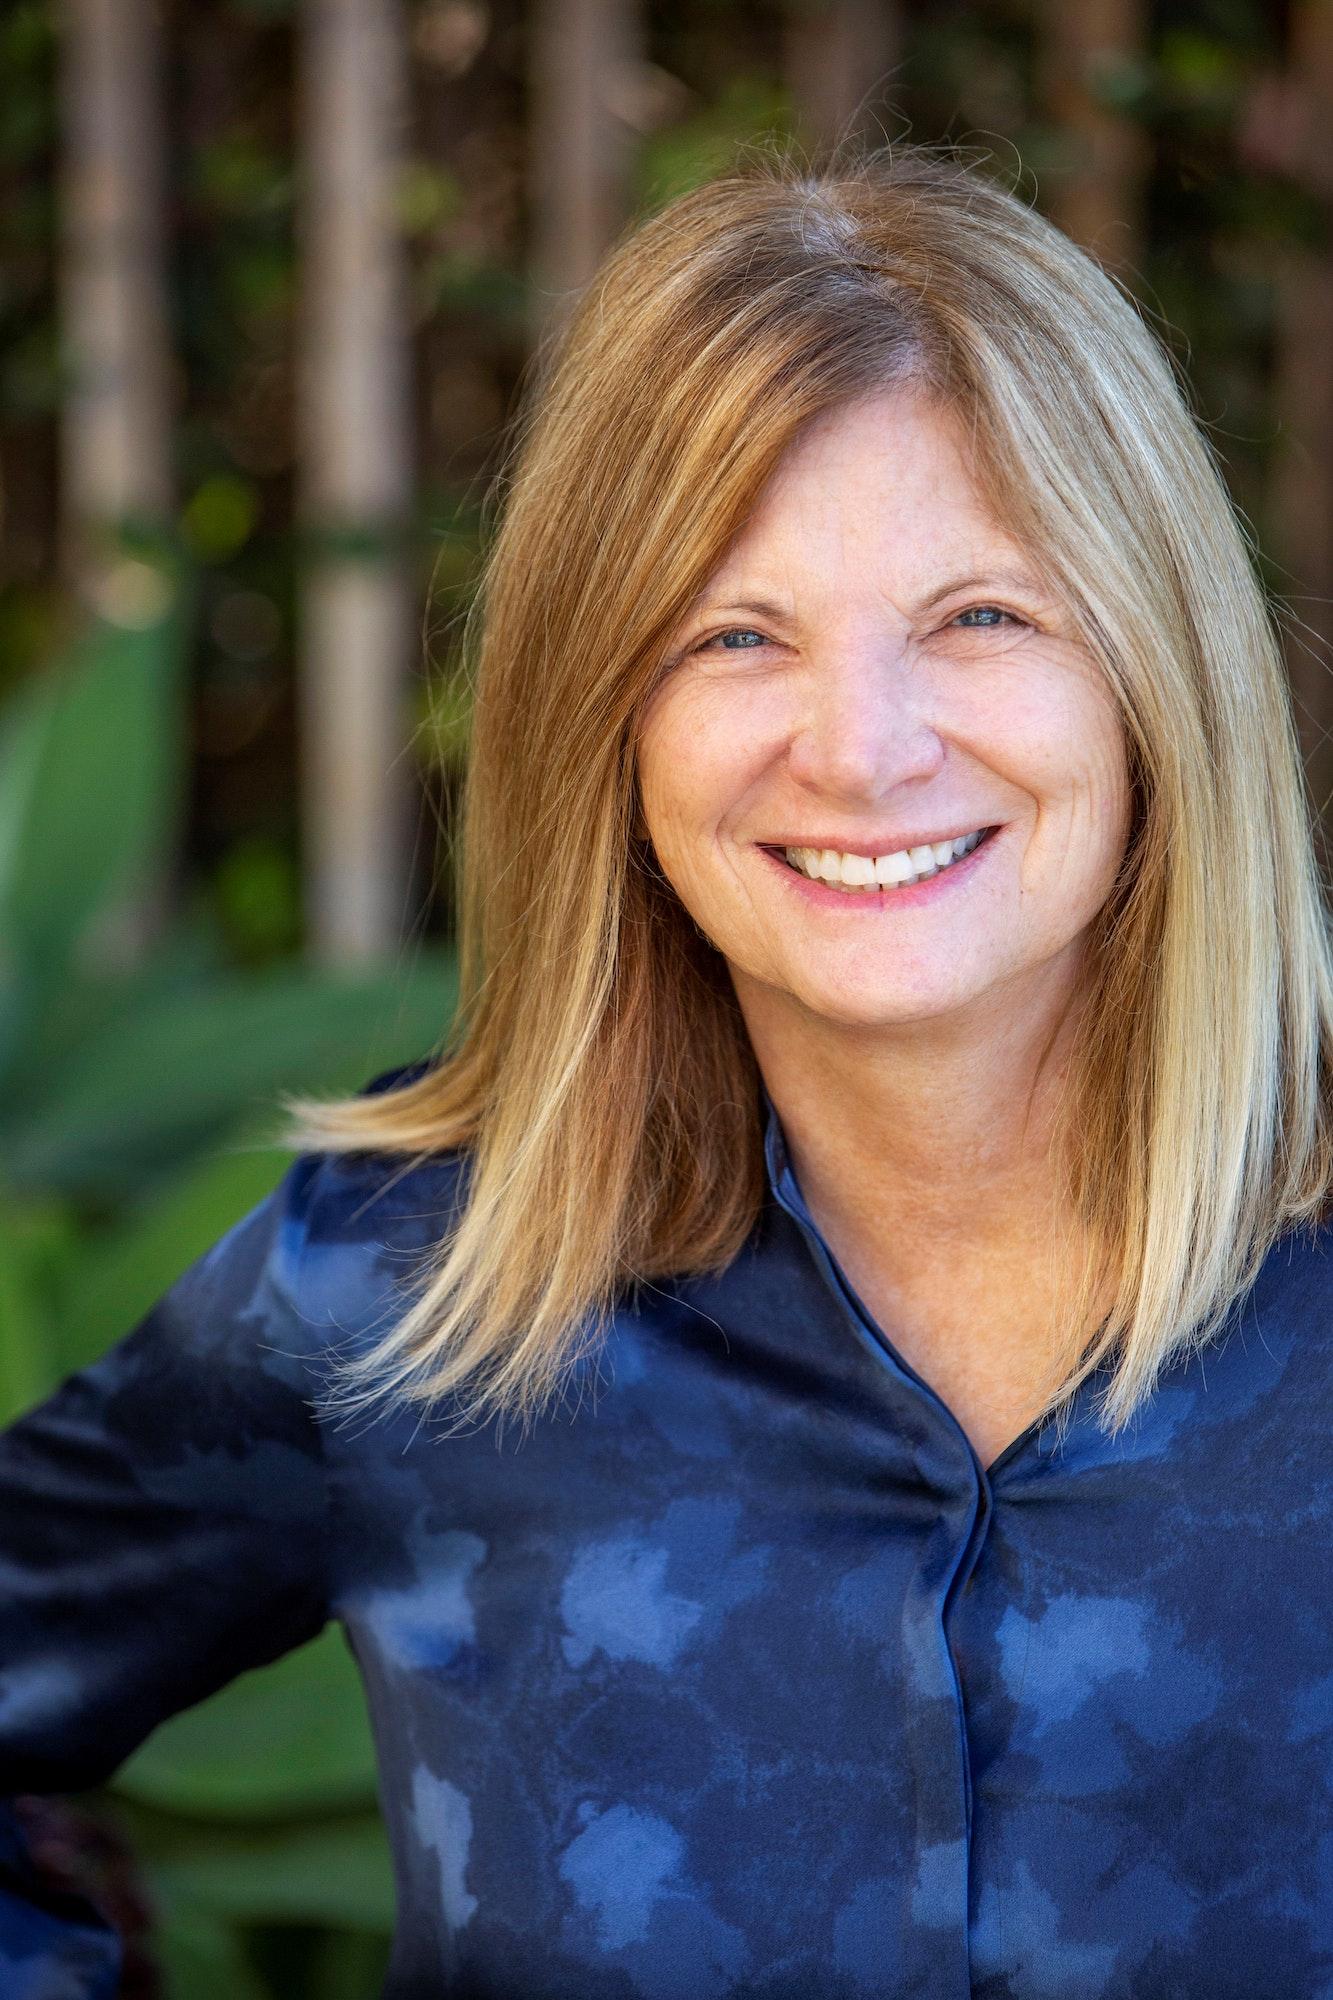 Laguna Beach Trustee, Sue Kempf